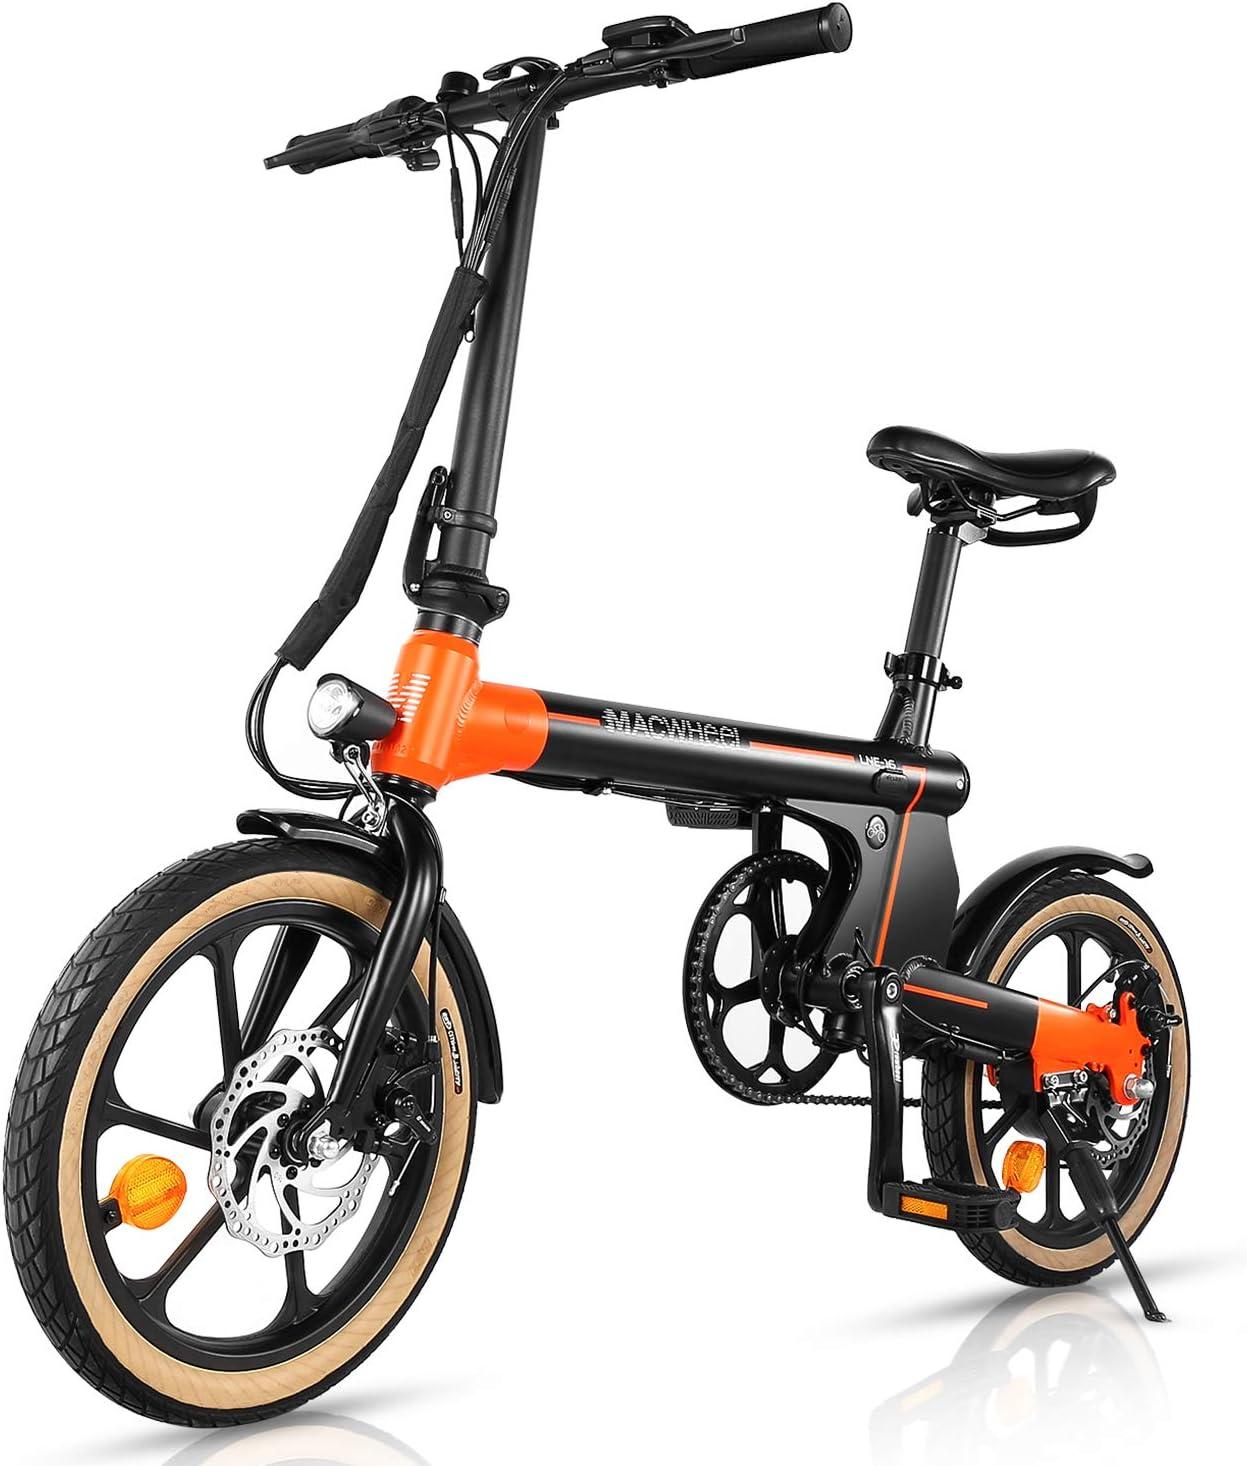 Macwheel Budget Portable Electric Bike